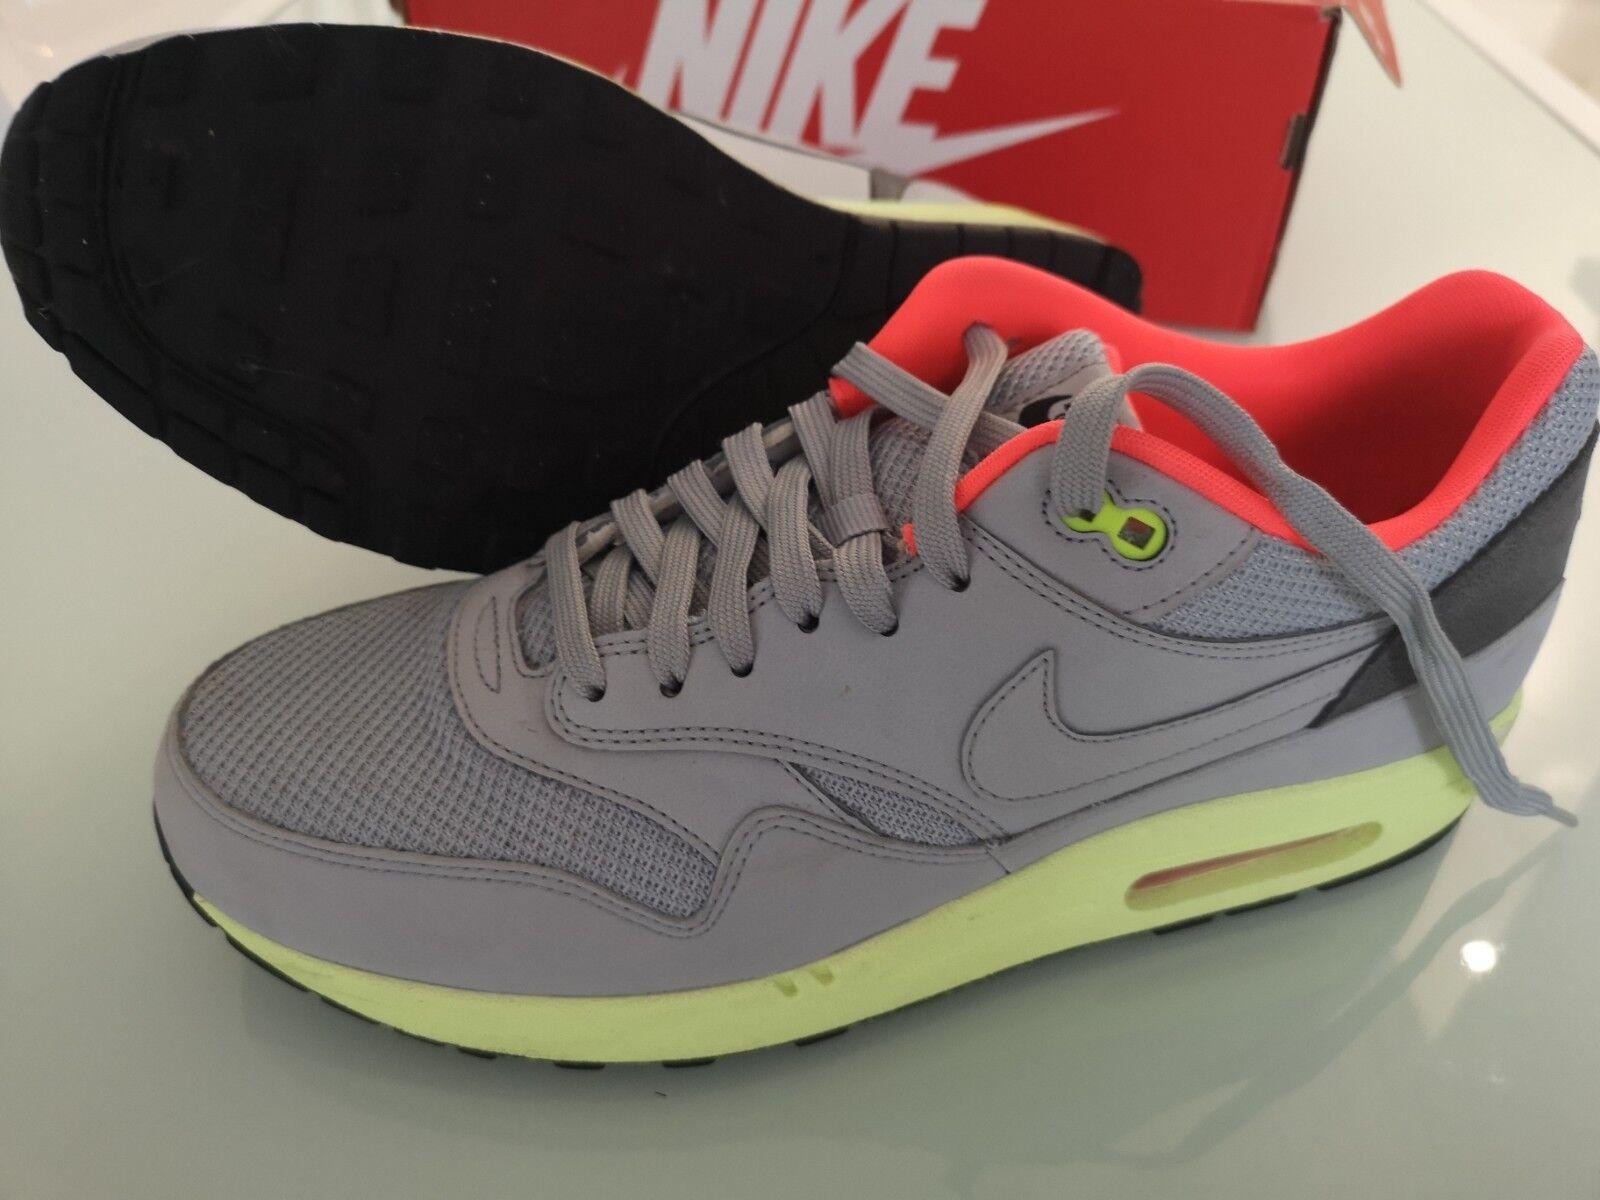 Nike Air Max 1 FB Wolf COLOR GRIGIO/LIME TG UK, US 11 EUR 44.5